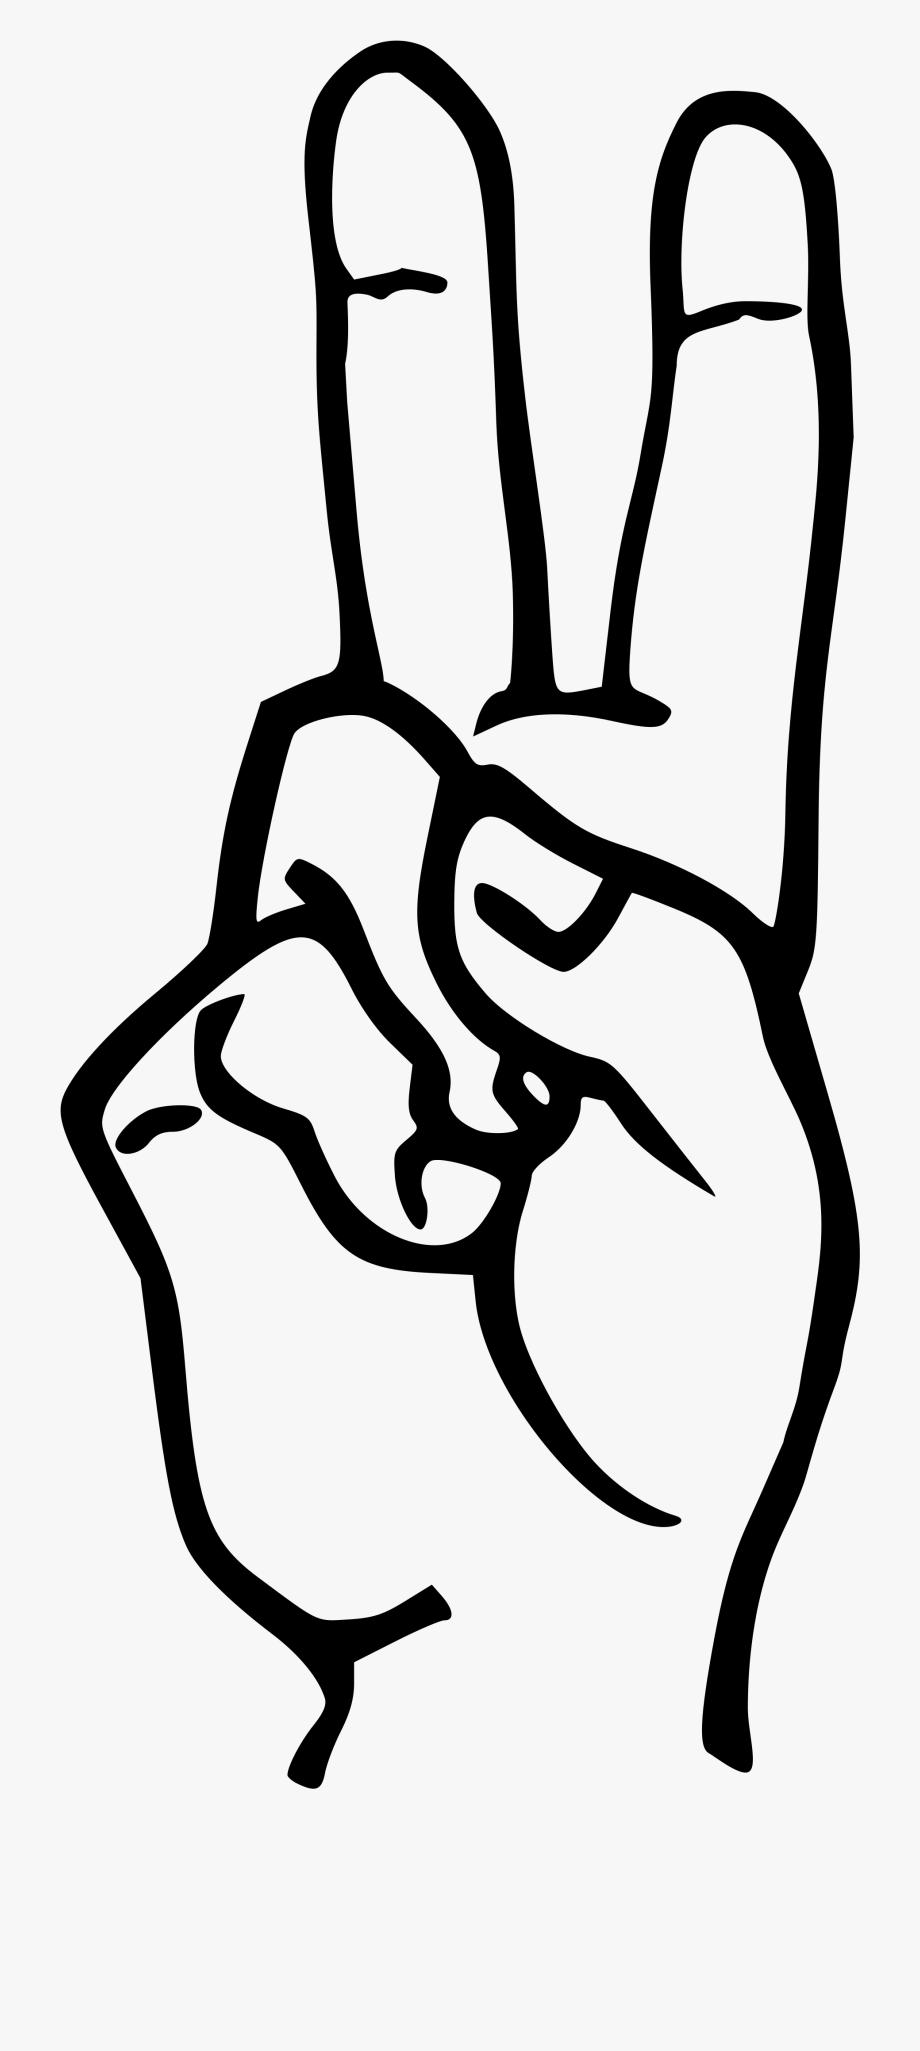 Clip Art Letter D In Sign Language.